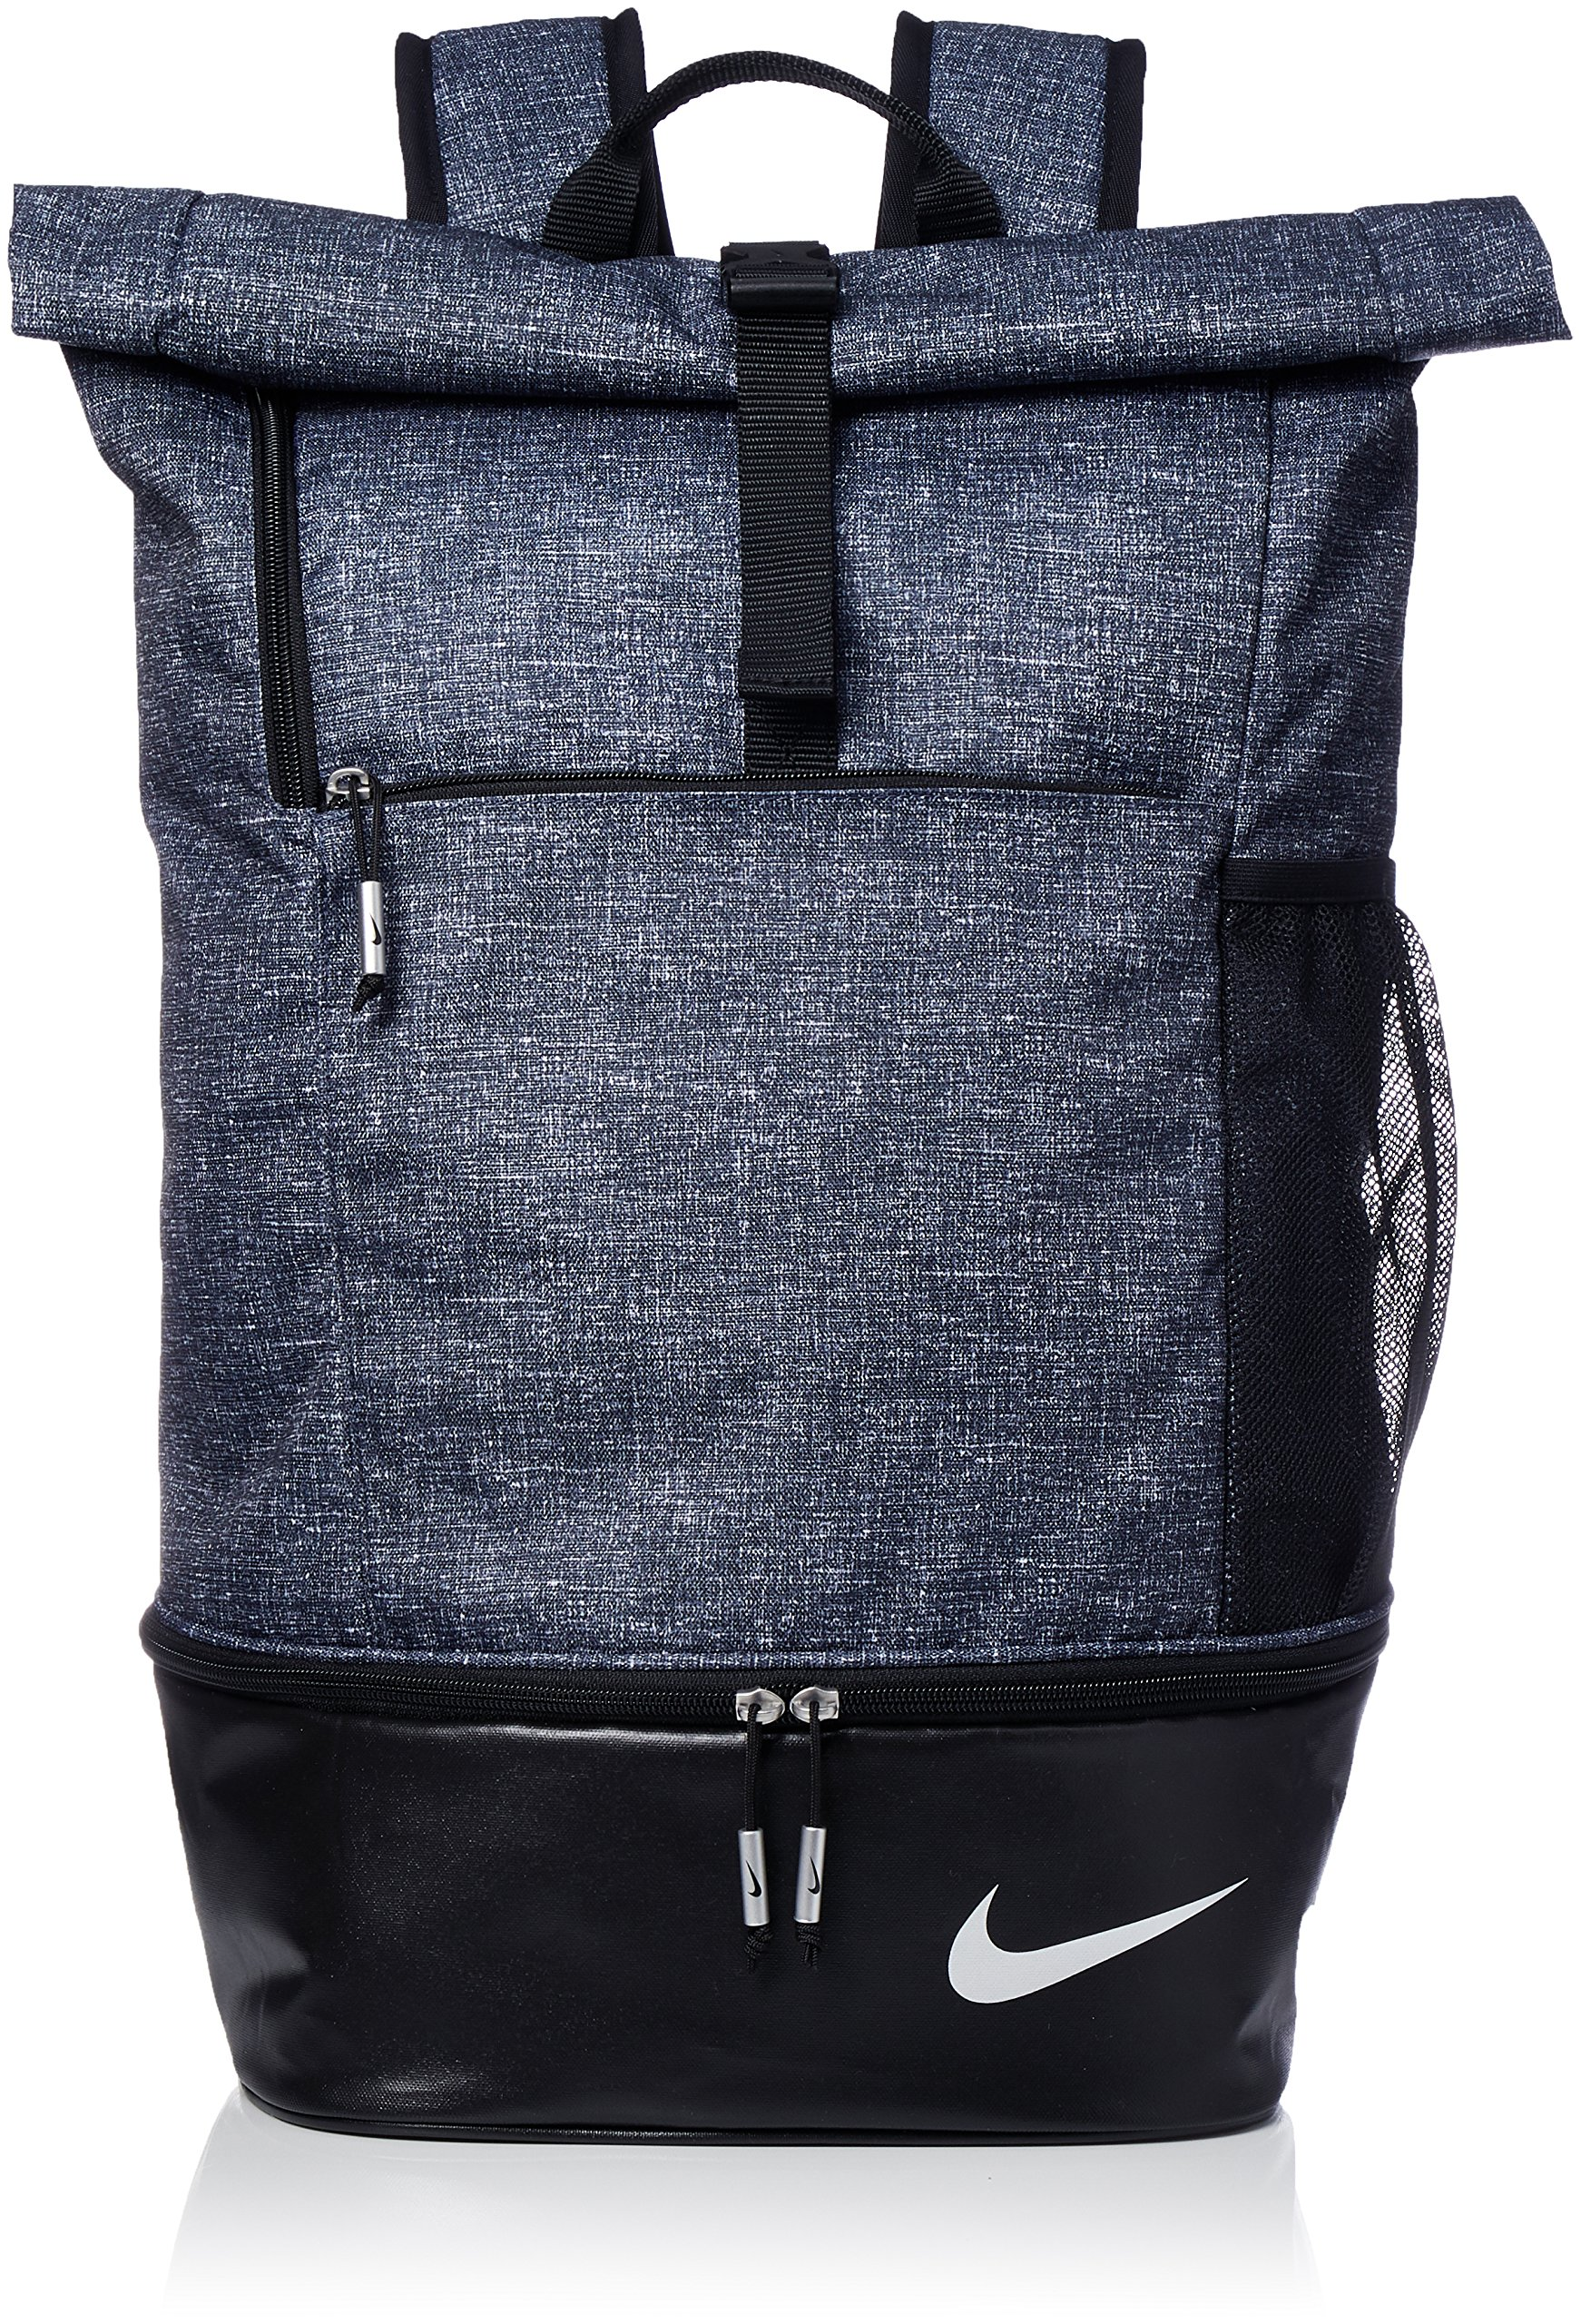 Galleon - Nike Sport III Golf Backpack (Thunder Blue Heather) be9e835e547c1